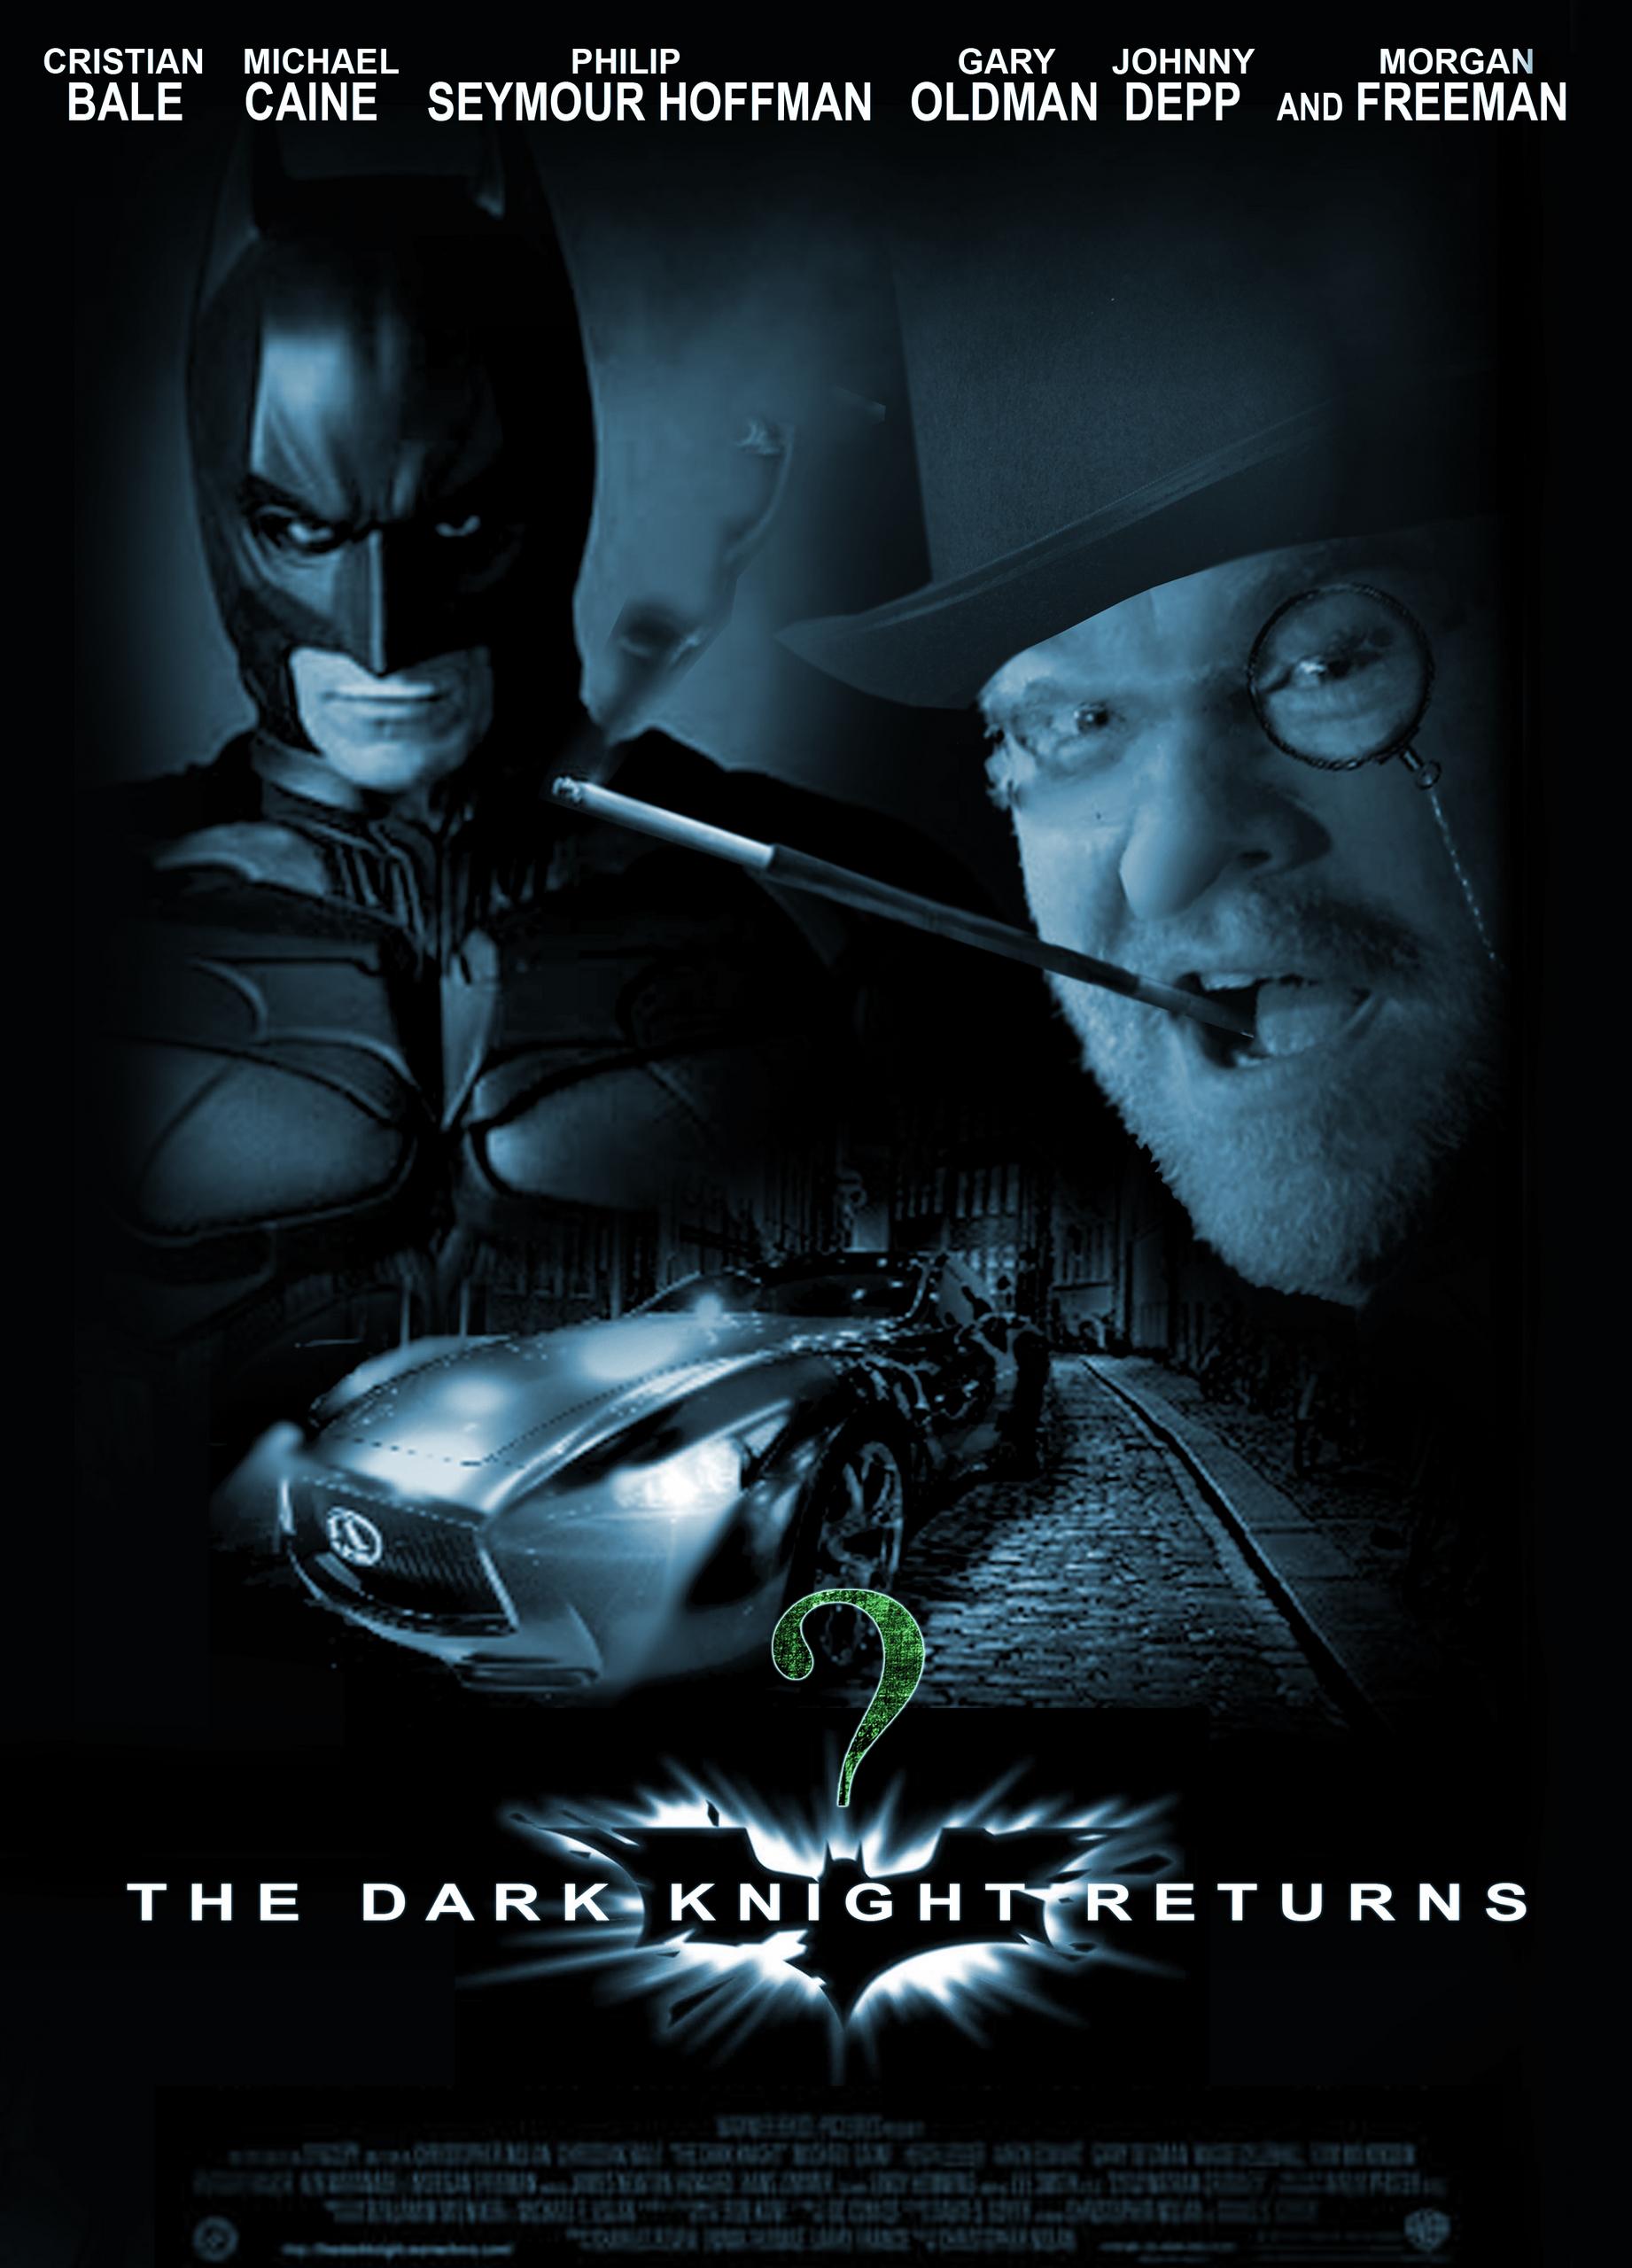 The Dark Knight Returns Batman Full HD Image for iPhone - Cartoons